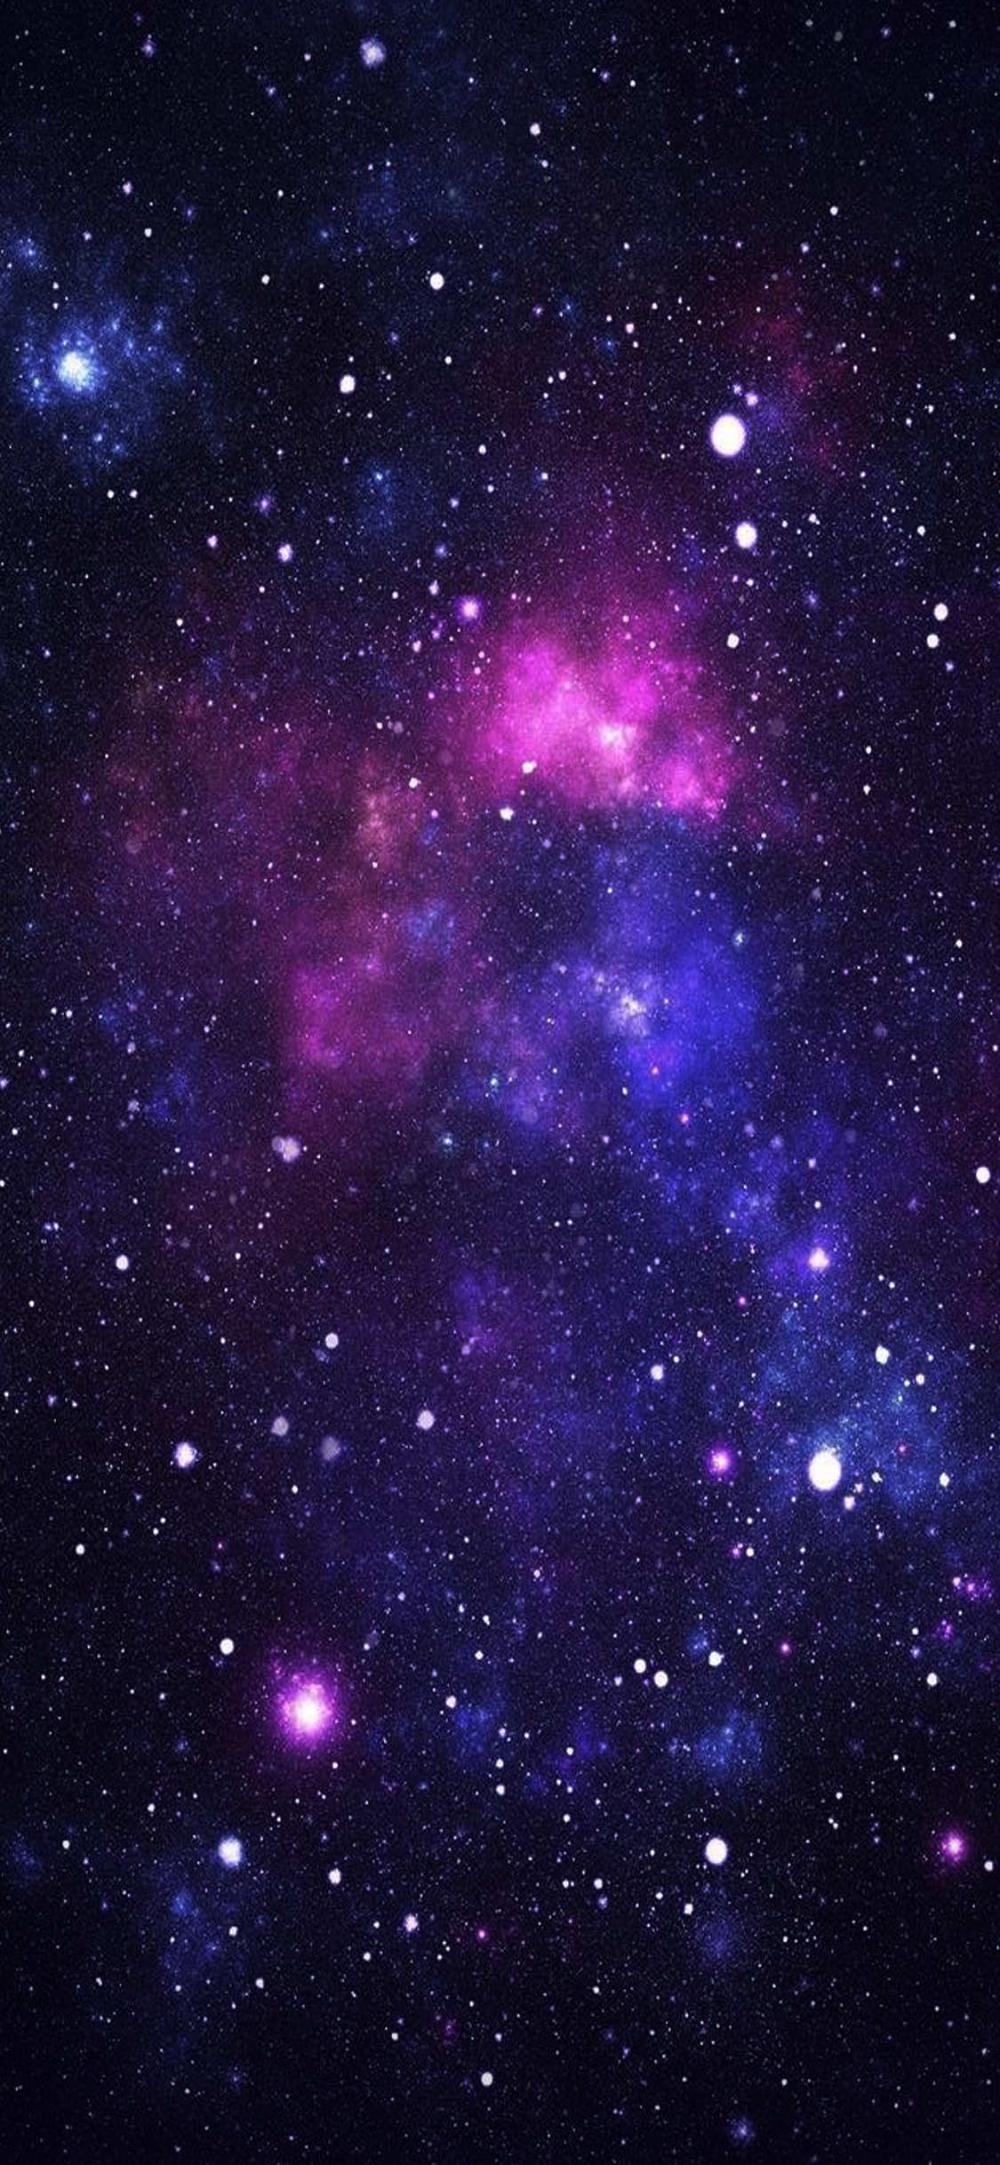 50 Iphone X Wallpaper Best Iphone Wallpapers Iphone Xs Max Wallpapers Iphone Background Iphone Wallpaper Tumblr Iphone X Wall Nebula Astronomy Galaxy Art